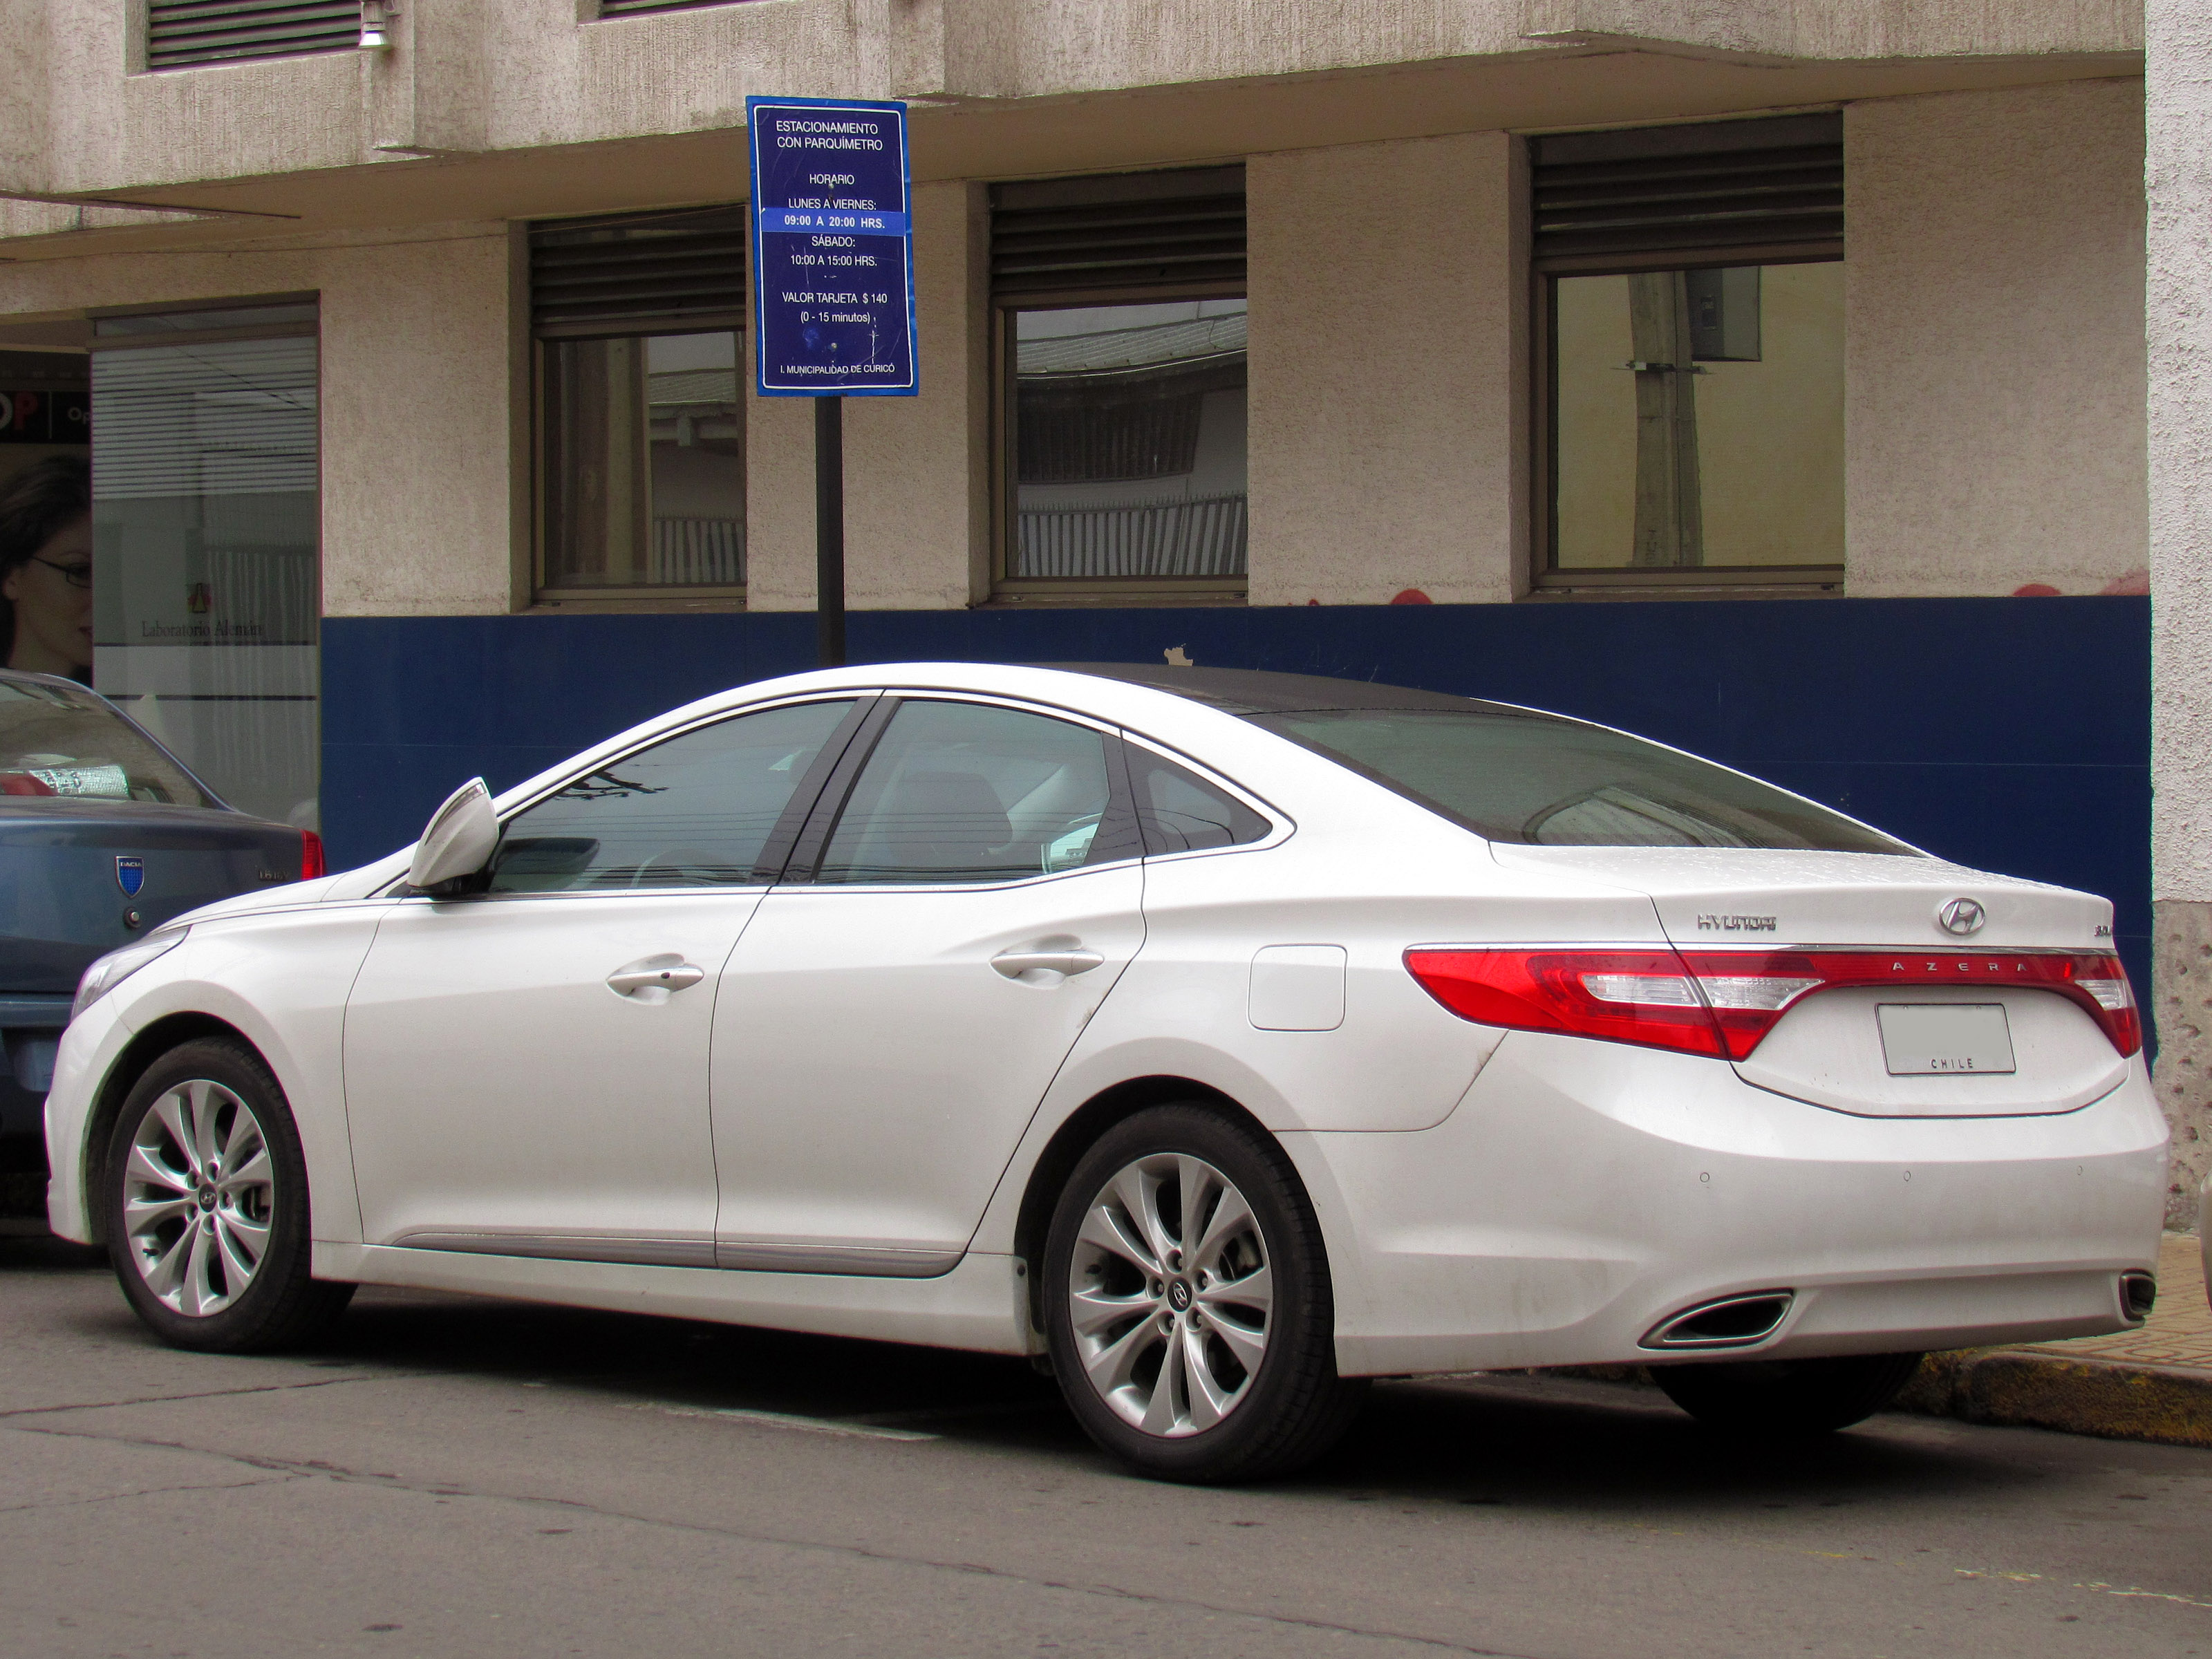 File Hyundai Azera V6 Gls 2014 15506694761 Jpg Wikimedia Commons